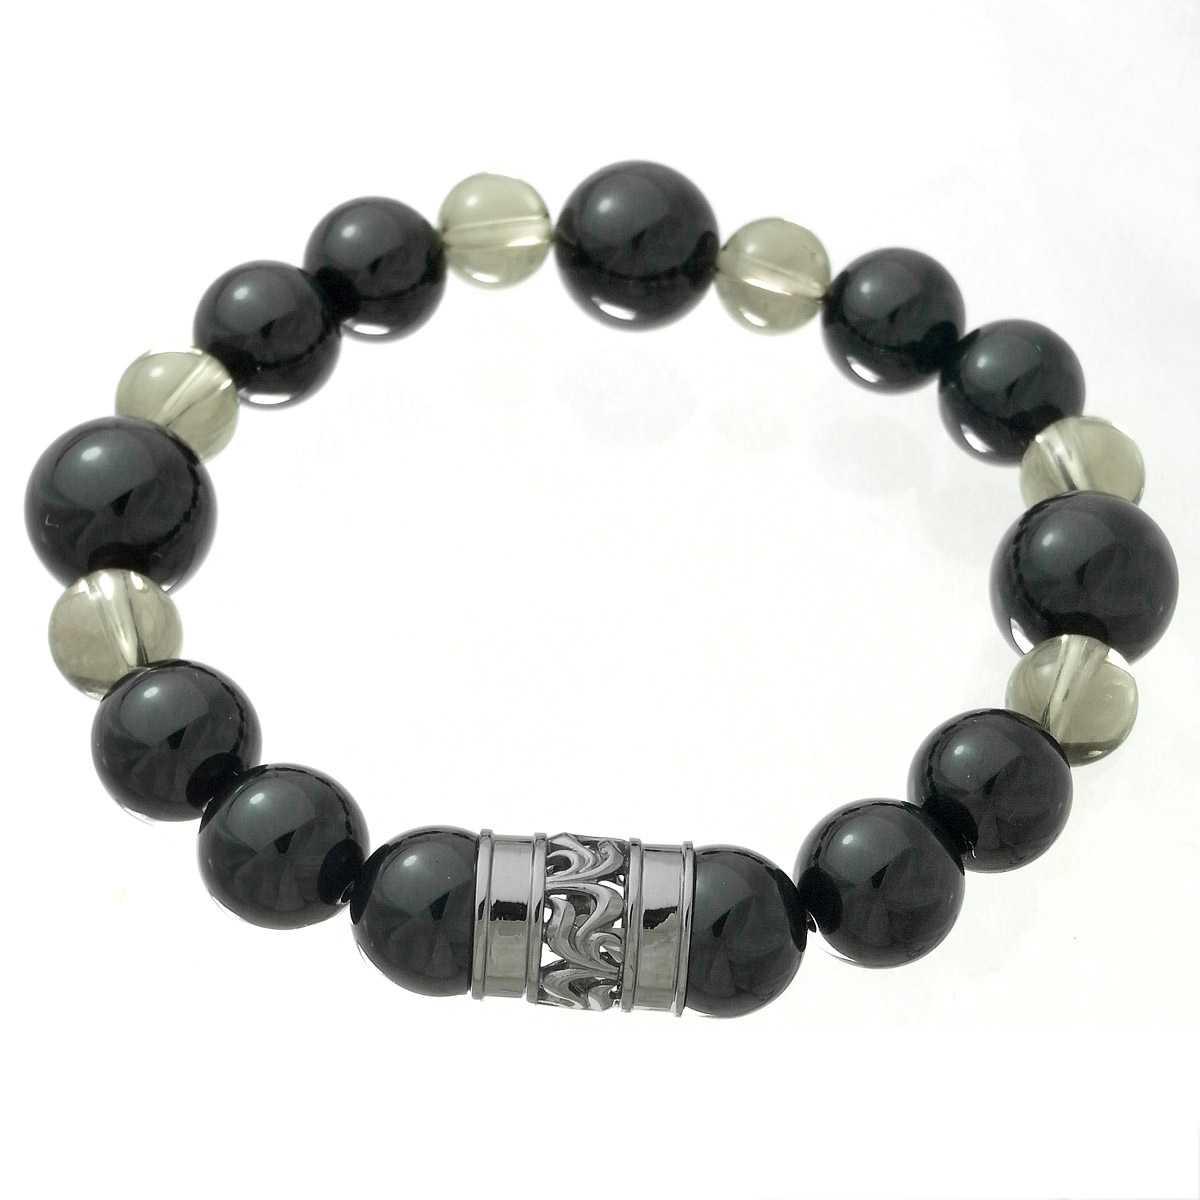 Royal Stag Zest ロイヤルスタッグゼスト パワーストーン 天然石ブレスレット 数珠 オニキスベース SBR25-006